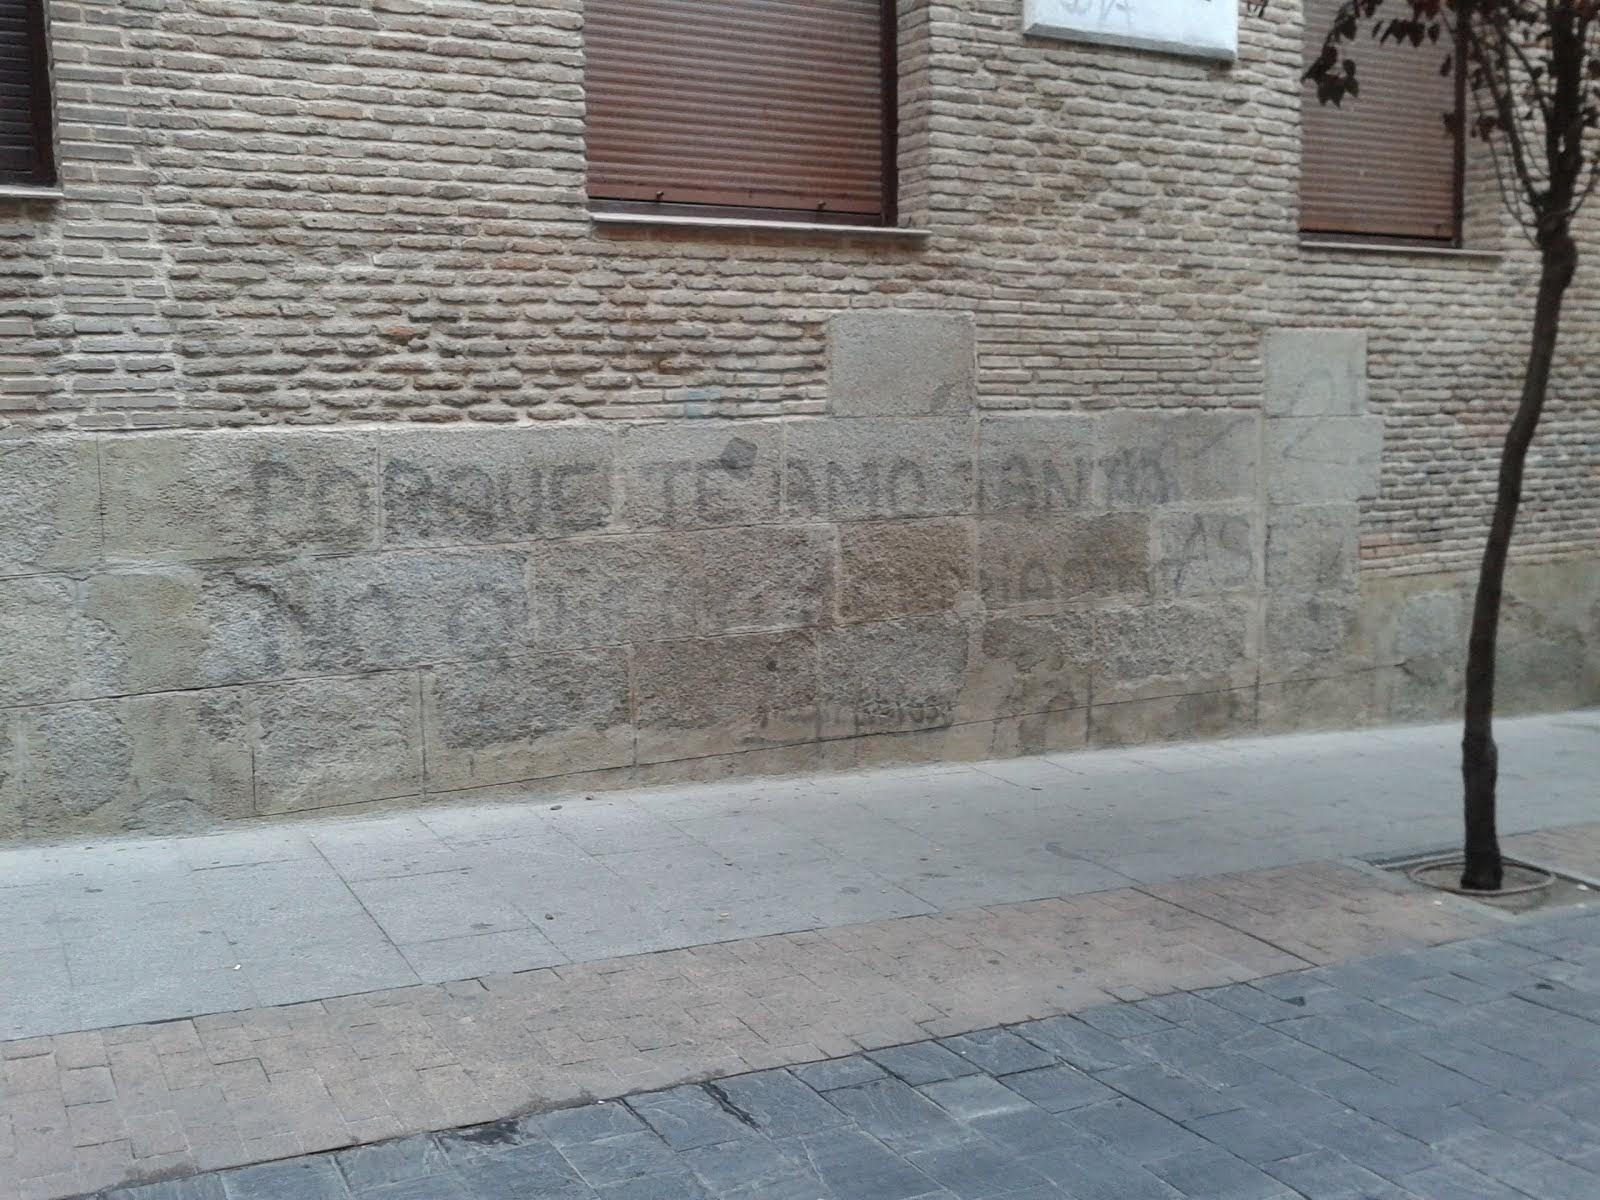 Batania Neorrabioso (Madrid) a medio borrar